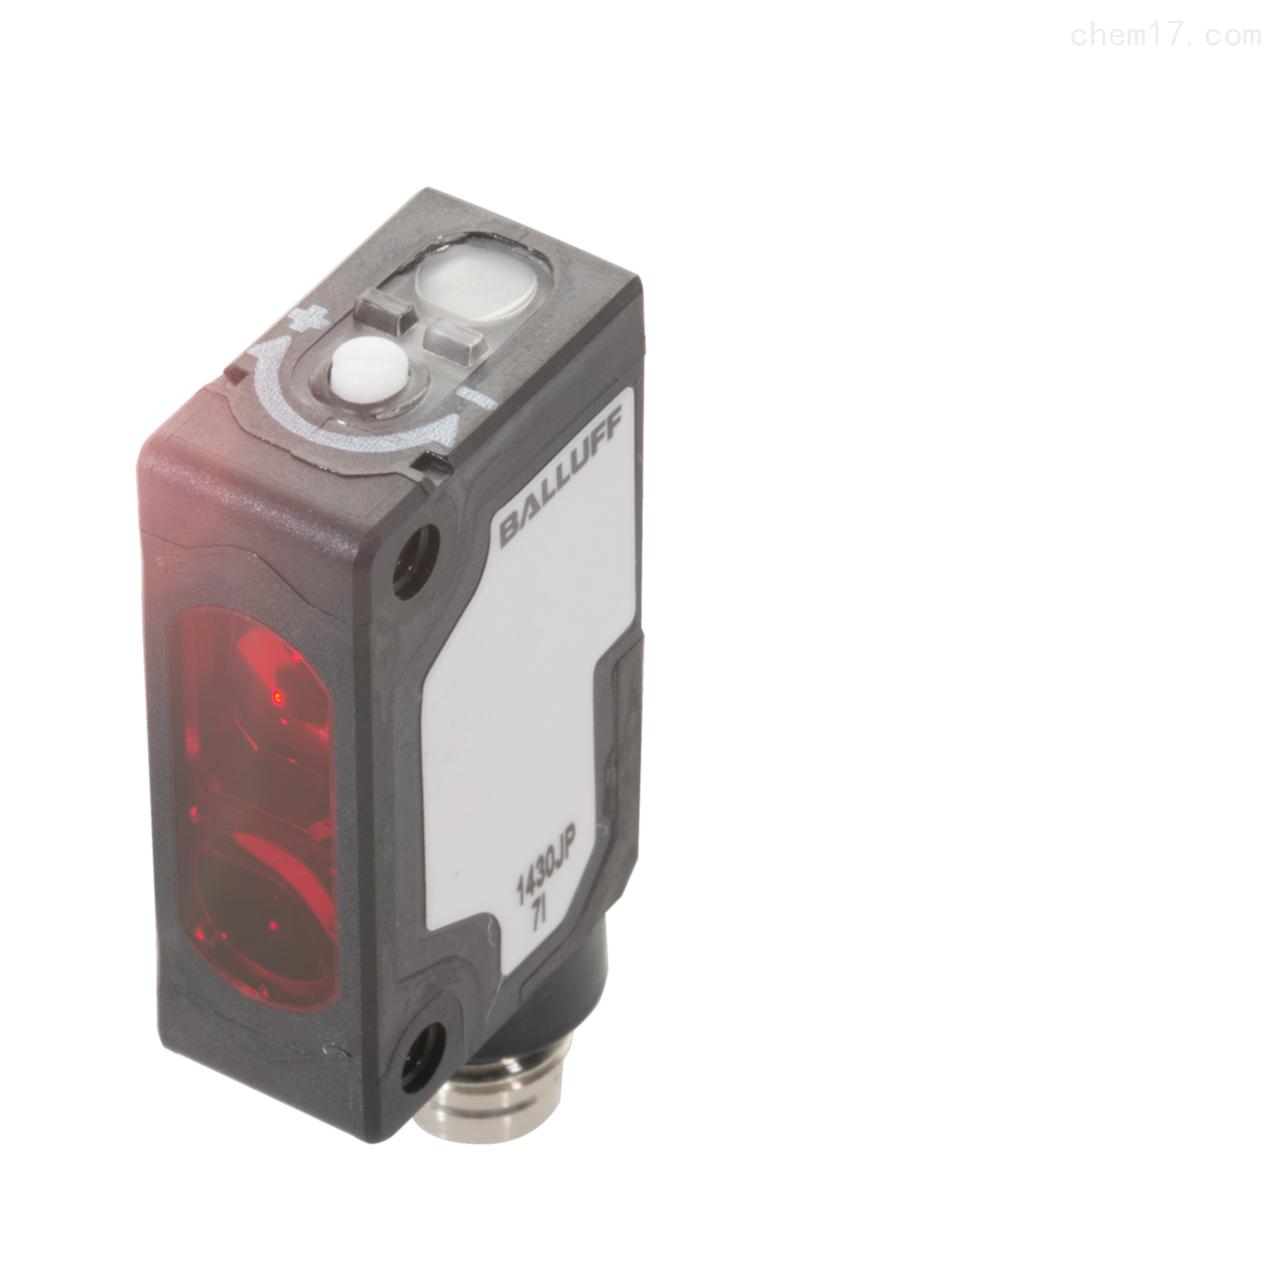 BALLUFF巴鲁夫传感器BESM18MI型现货特价